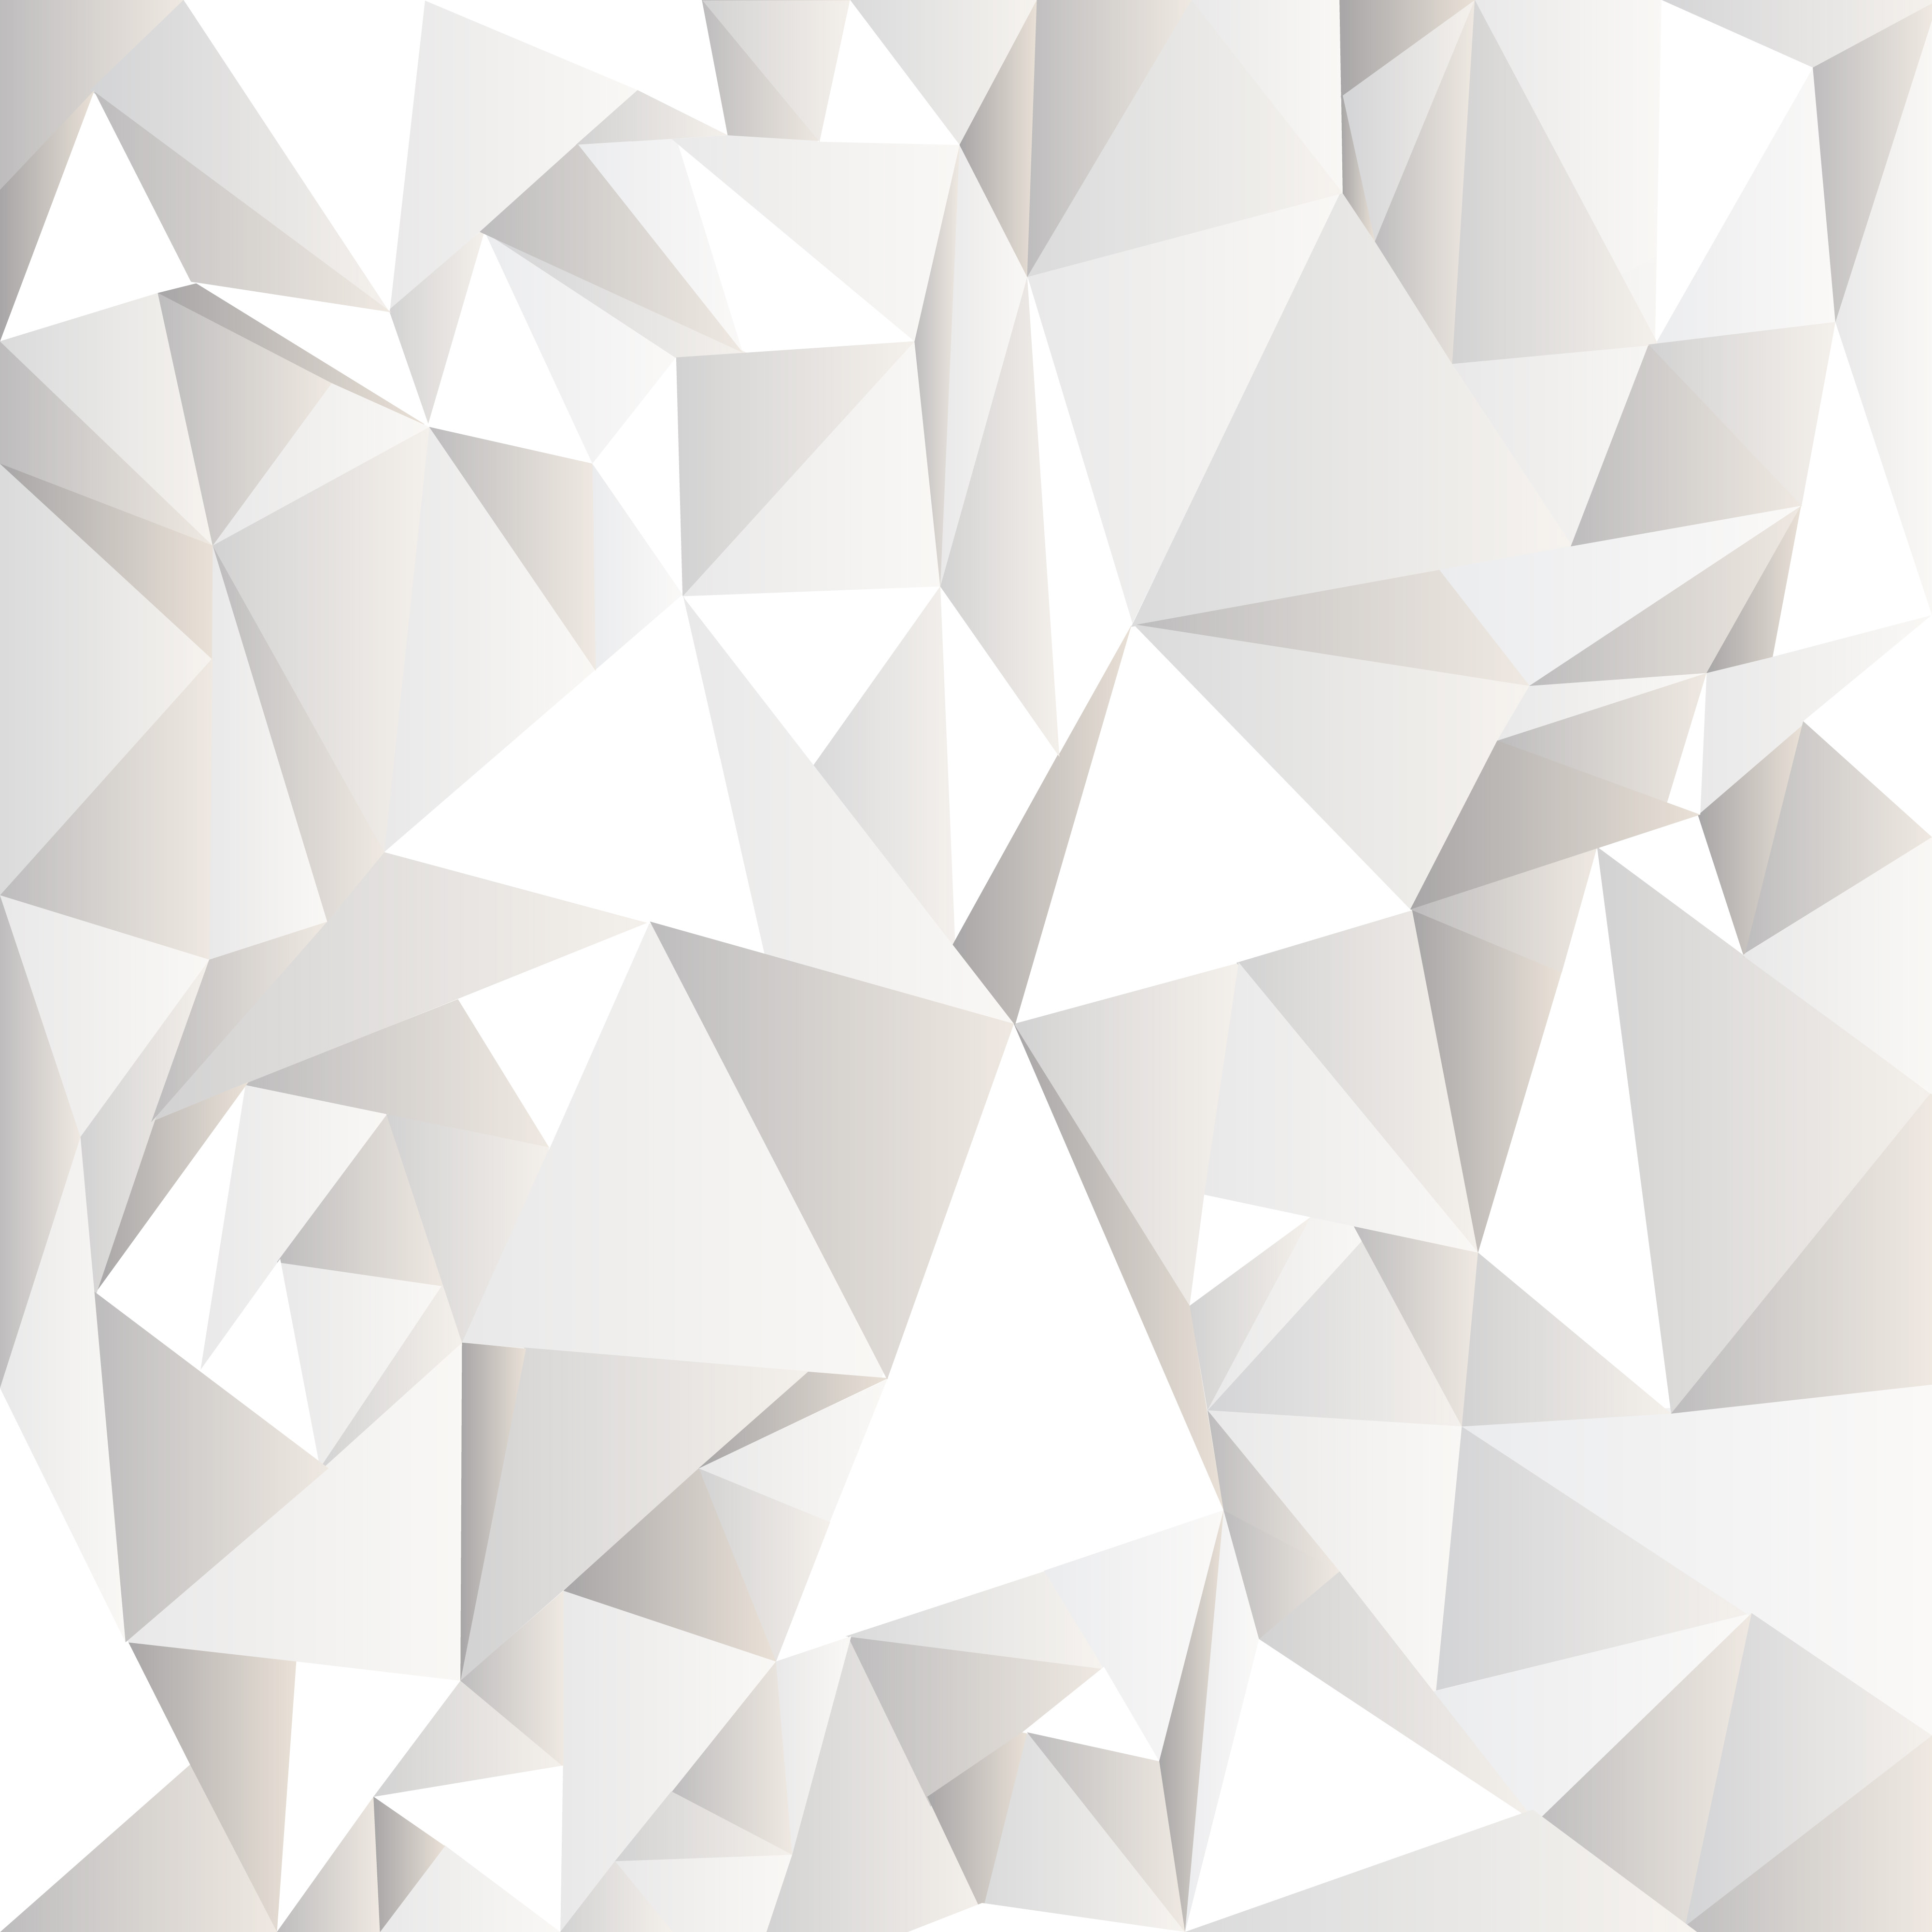 Vector Flower Black White Background Wallpaper: Материалы за Март 2015 года » Векторные клипарты